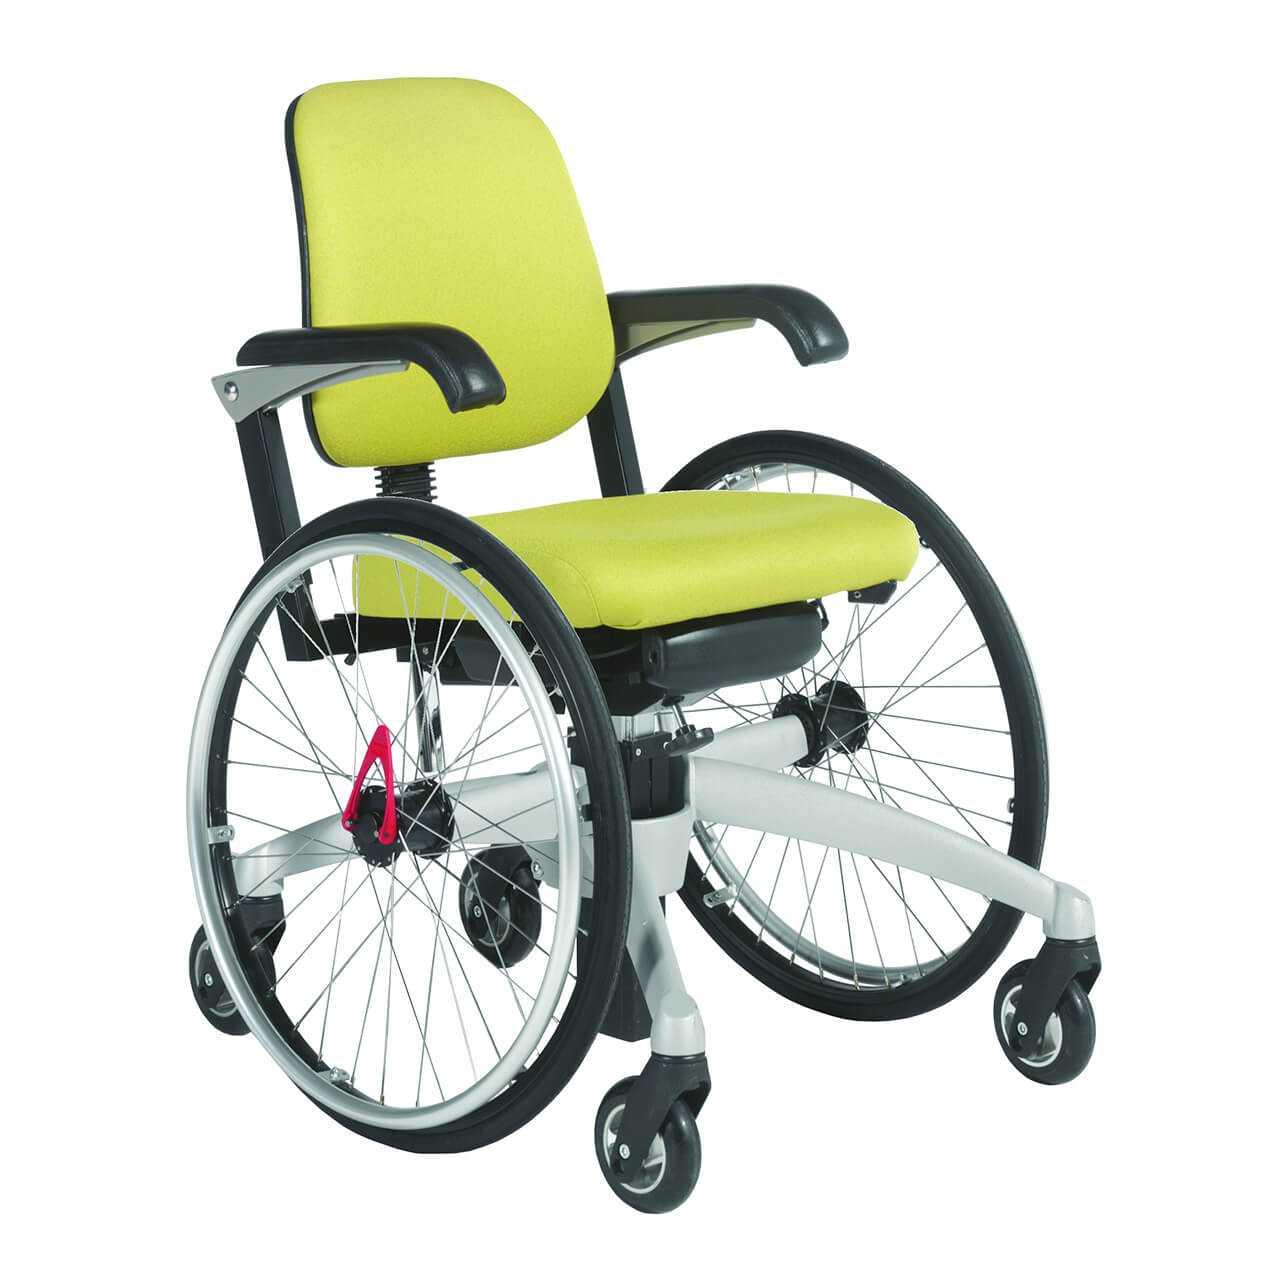 Le tripple wheels trippelstoelen ARTNRNNB 0000s 0002 Schuin